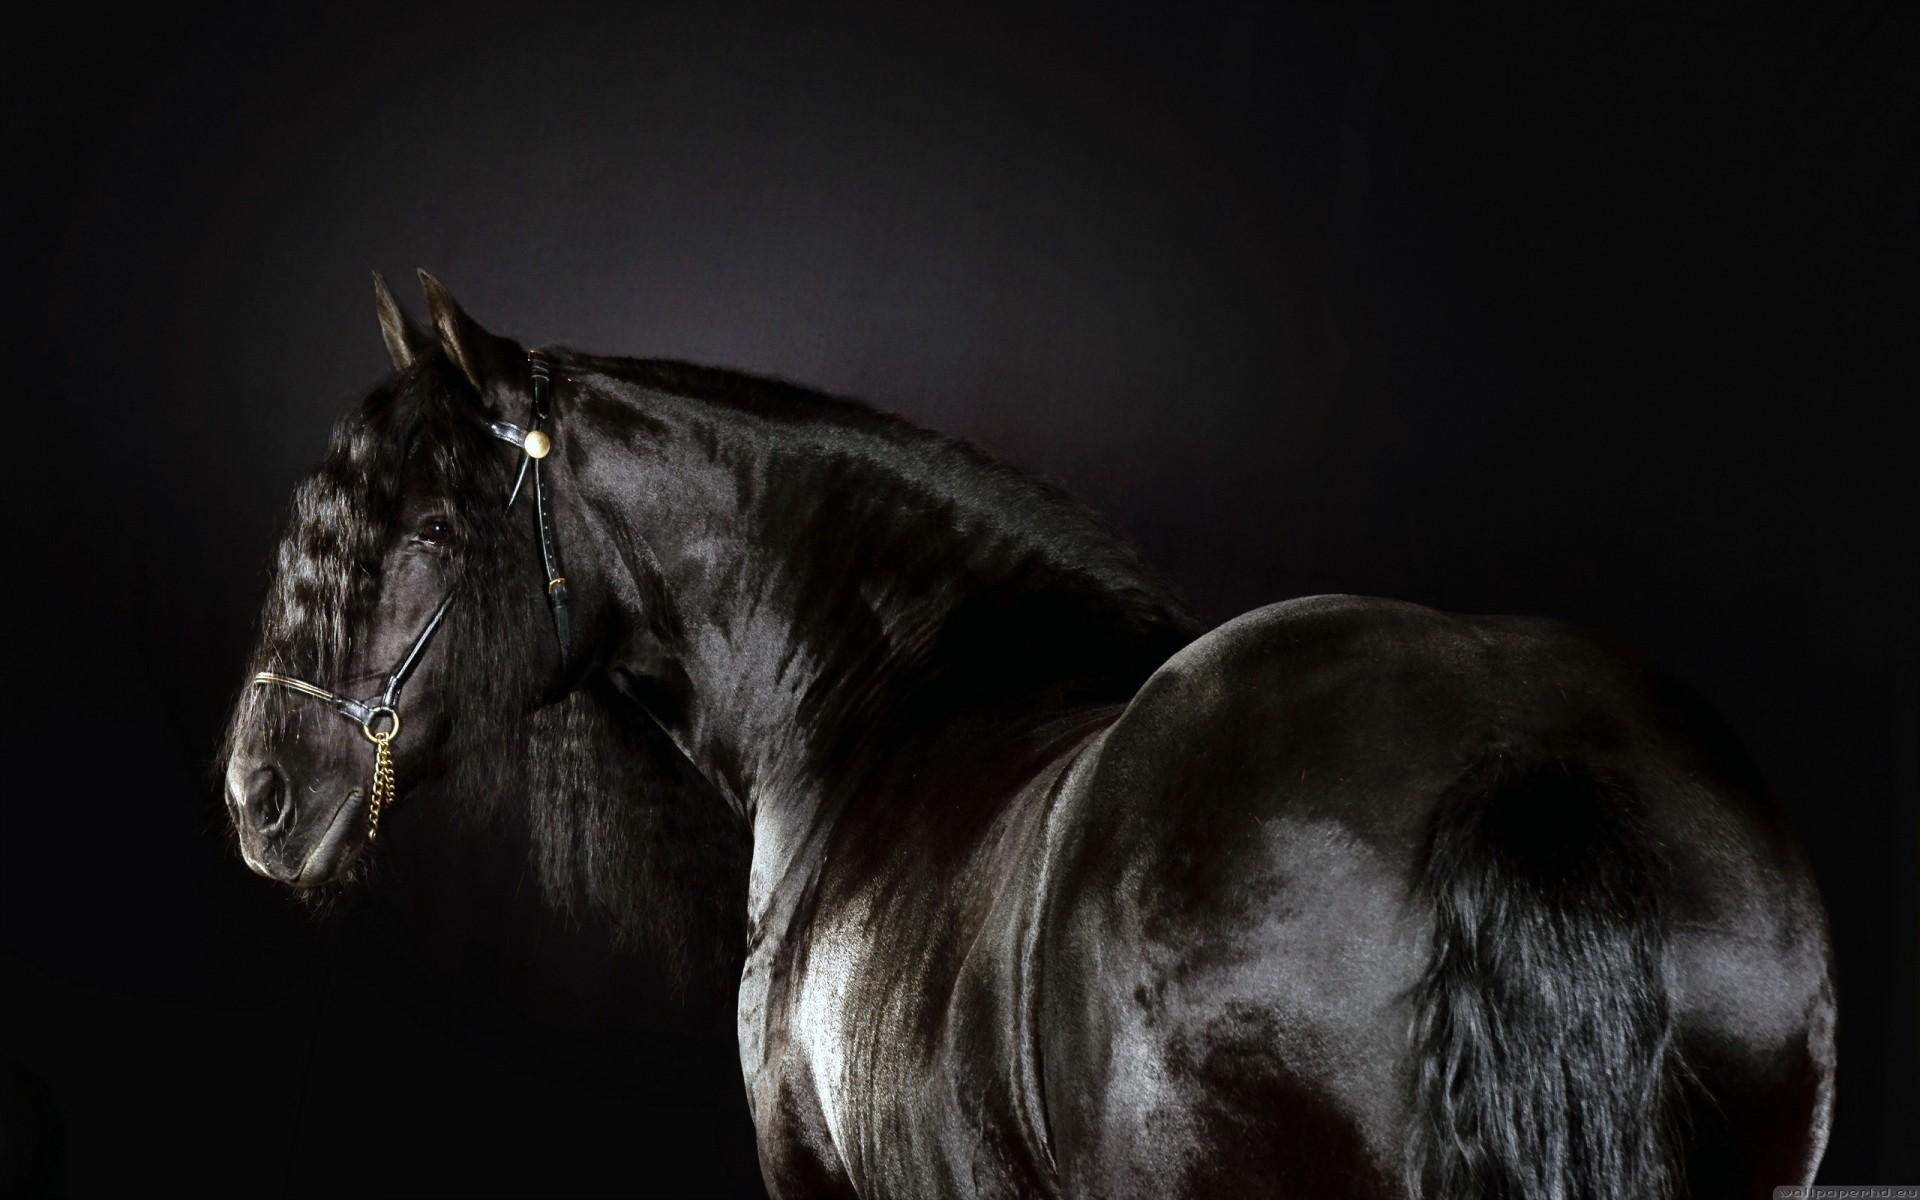 Black Animals Horses Friesian Horse Horse Race Wallpaper 1920x1200 185878 Wallpaperup